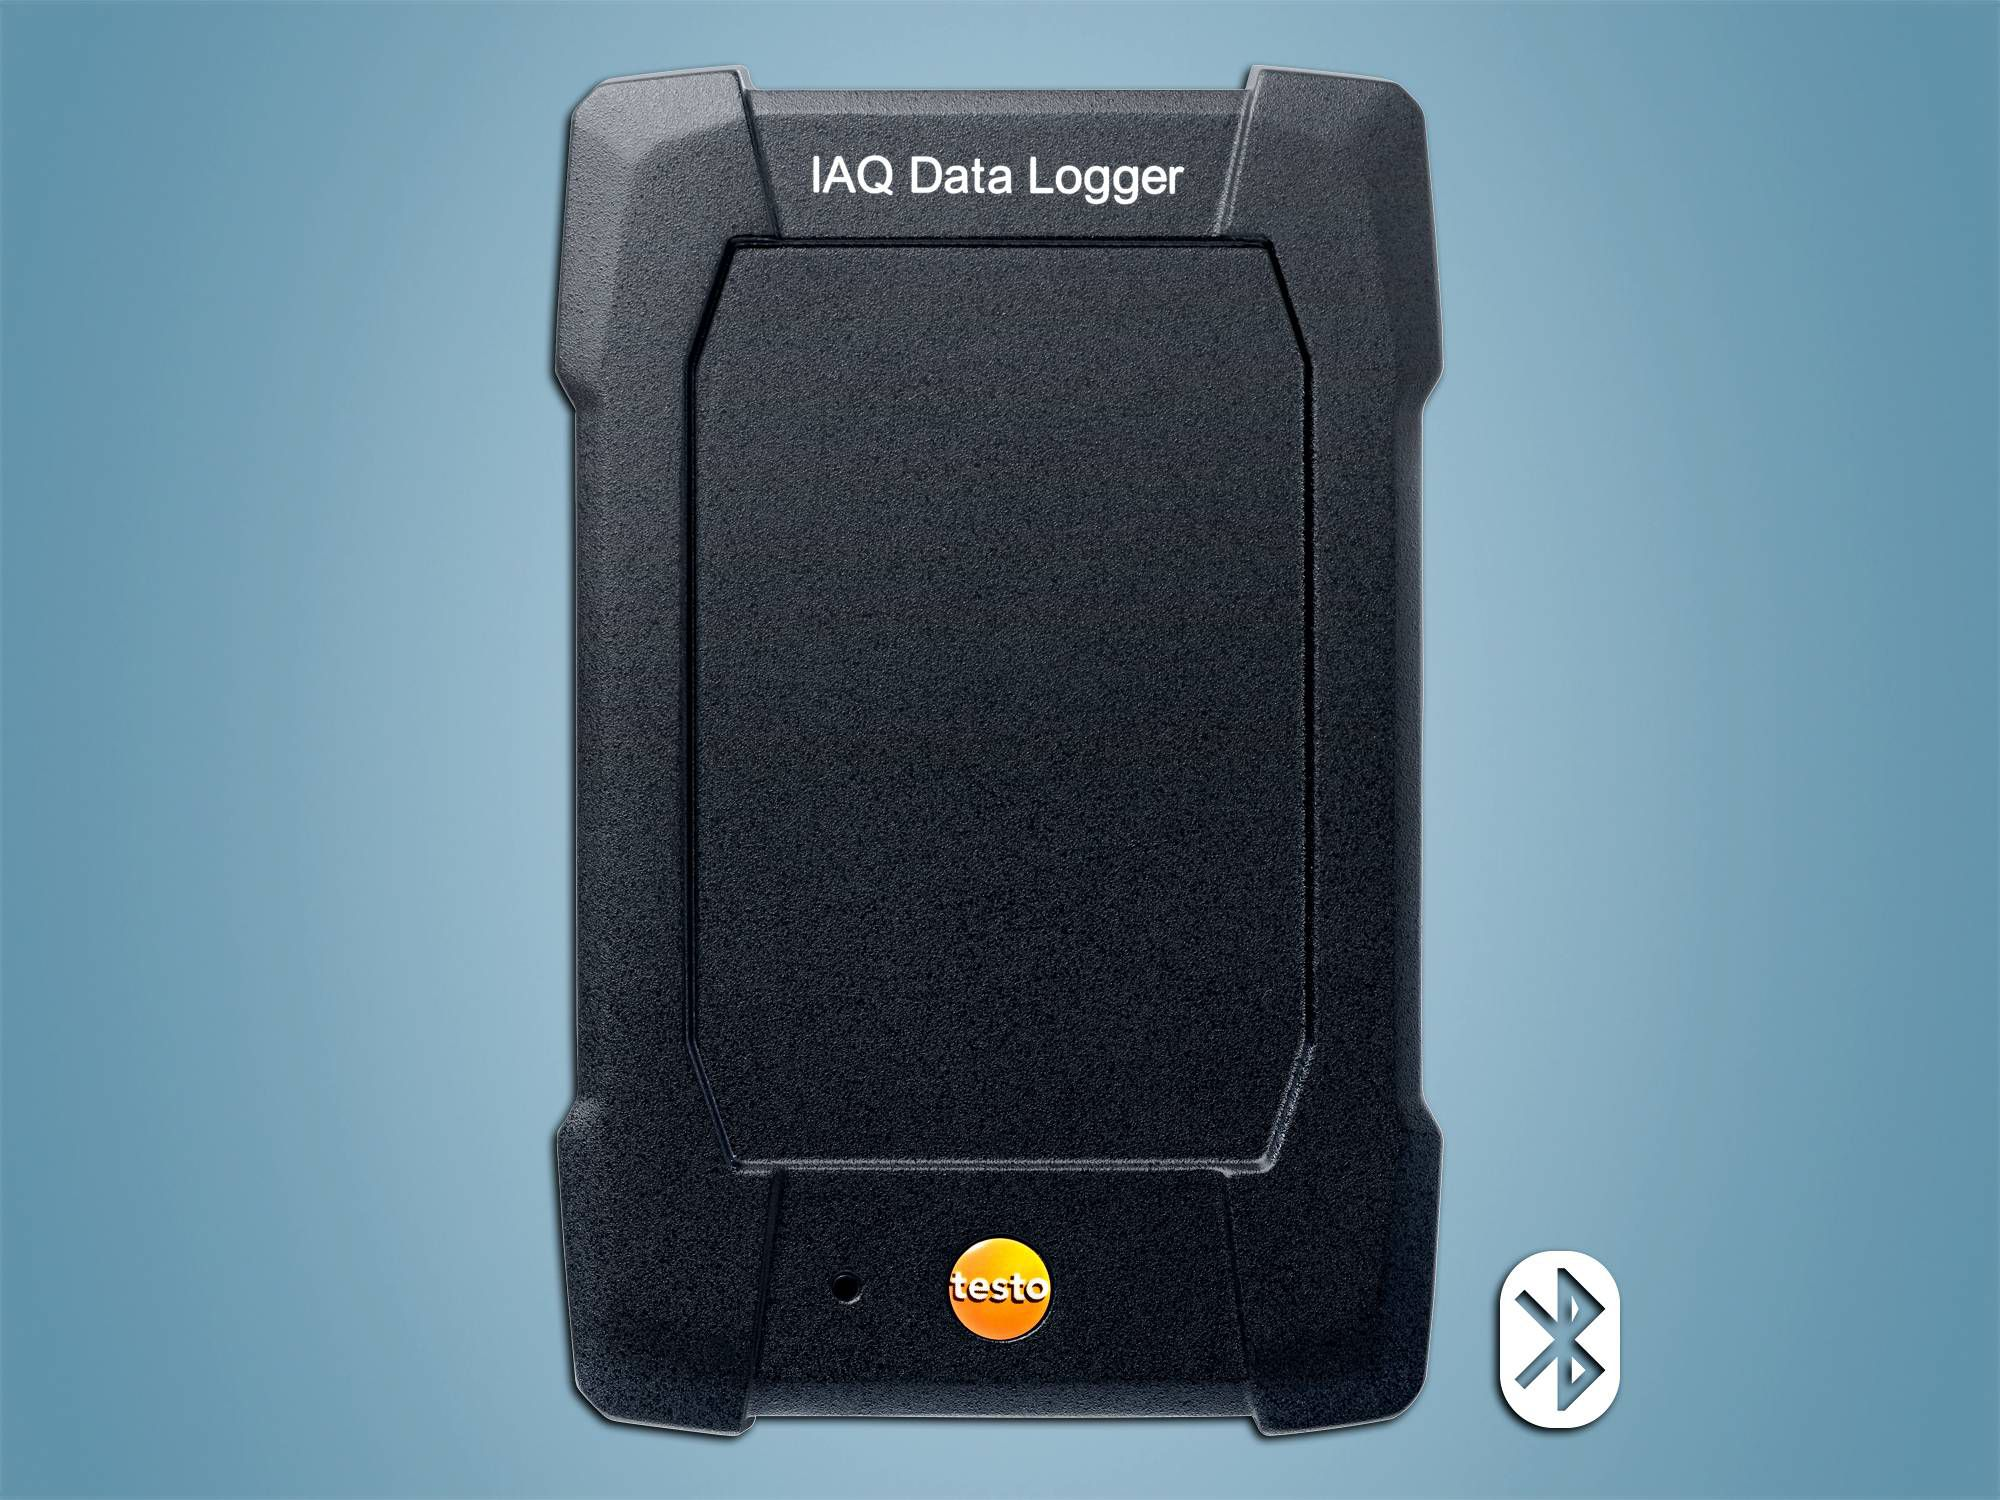 IAQ data logger testo 400